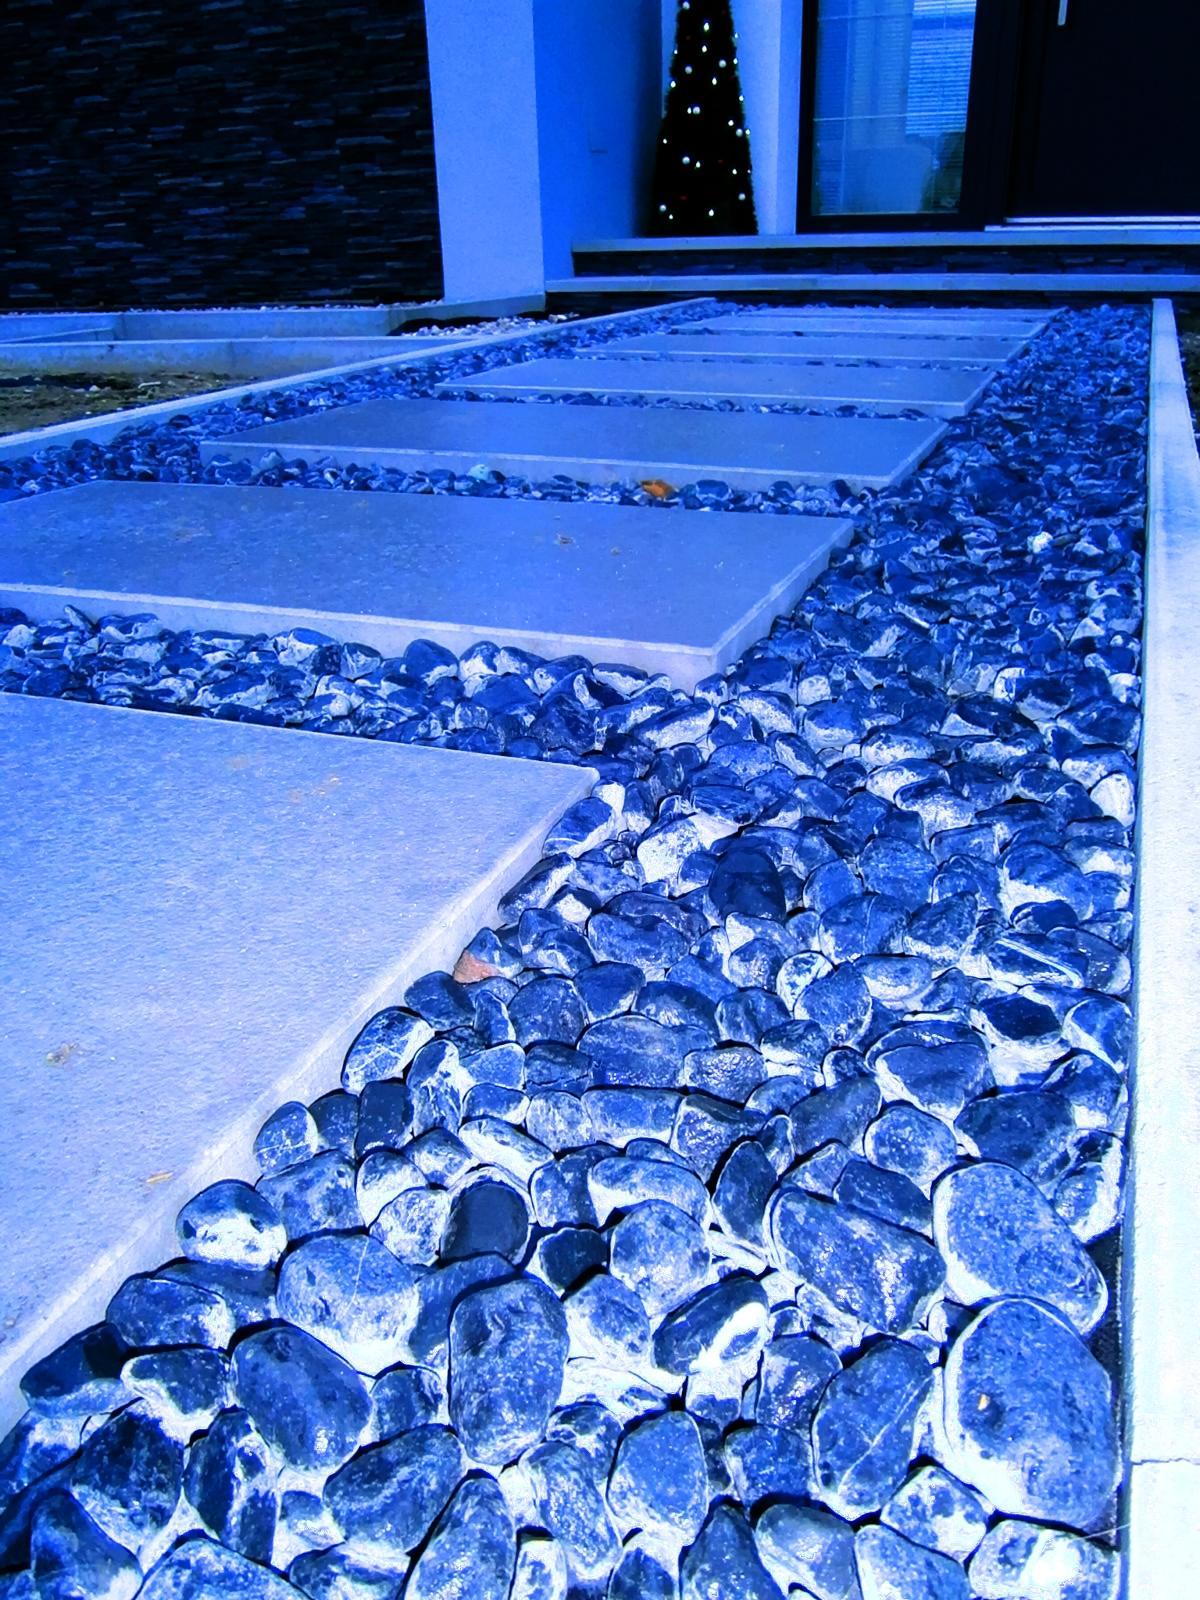 LINEAR 324 od...do... - dokonalo zamrznute - ani kamen sa nepohol, skoda ze neostanu tie kamene tejto farby :(